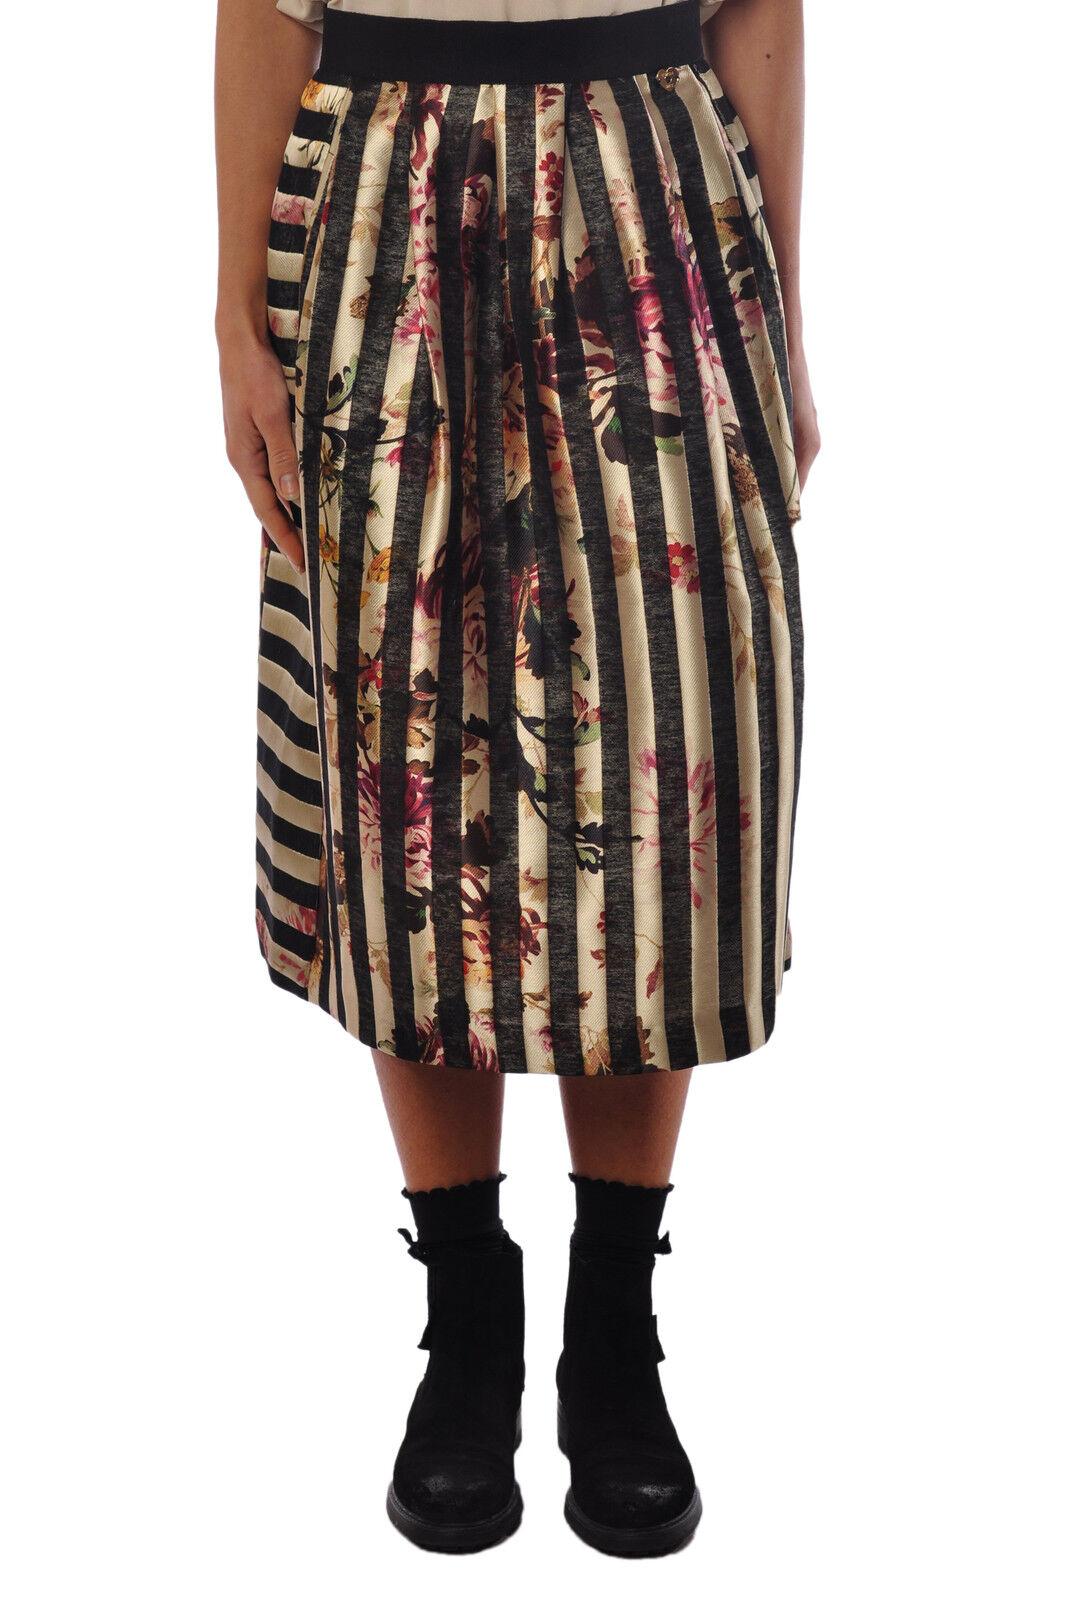 Twin Set  -  Skirts - Female - M - Fantasy - 1240126A160618